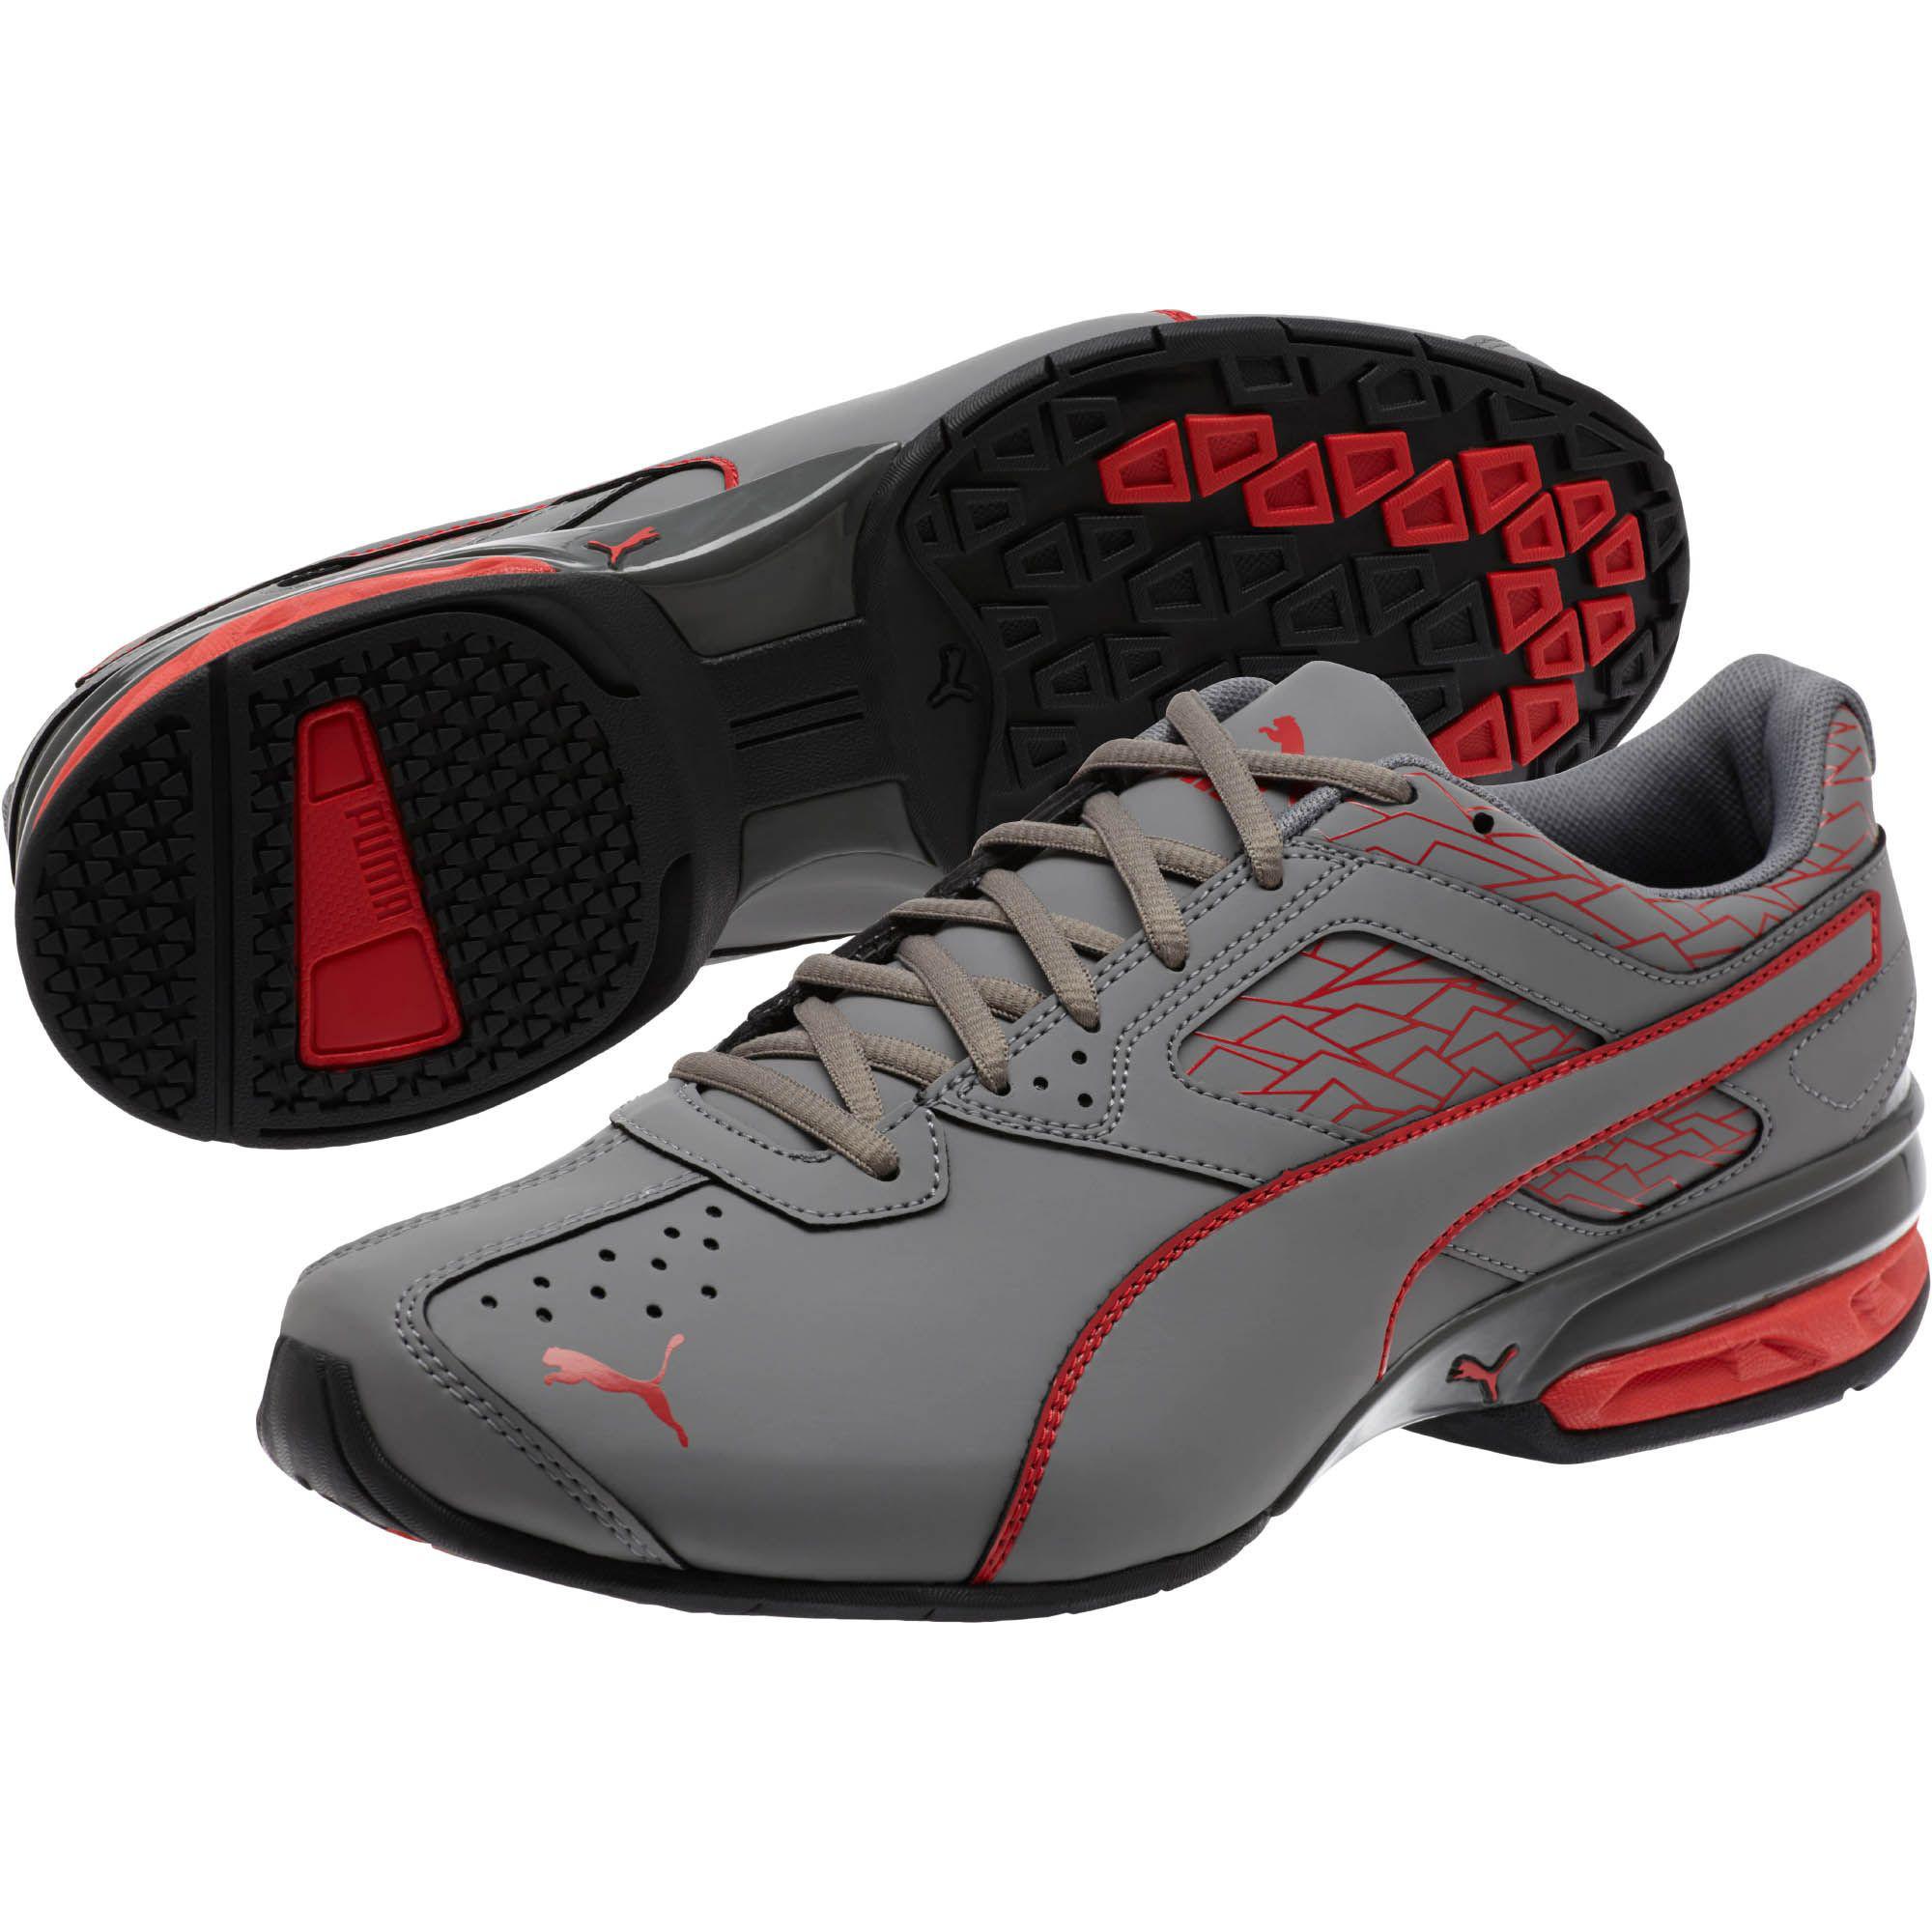 6d5033fa12 PUMA Tazon 6 Fracture FM Men's Sneakers Men Shoe Running   eBay